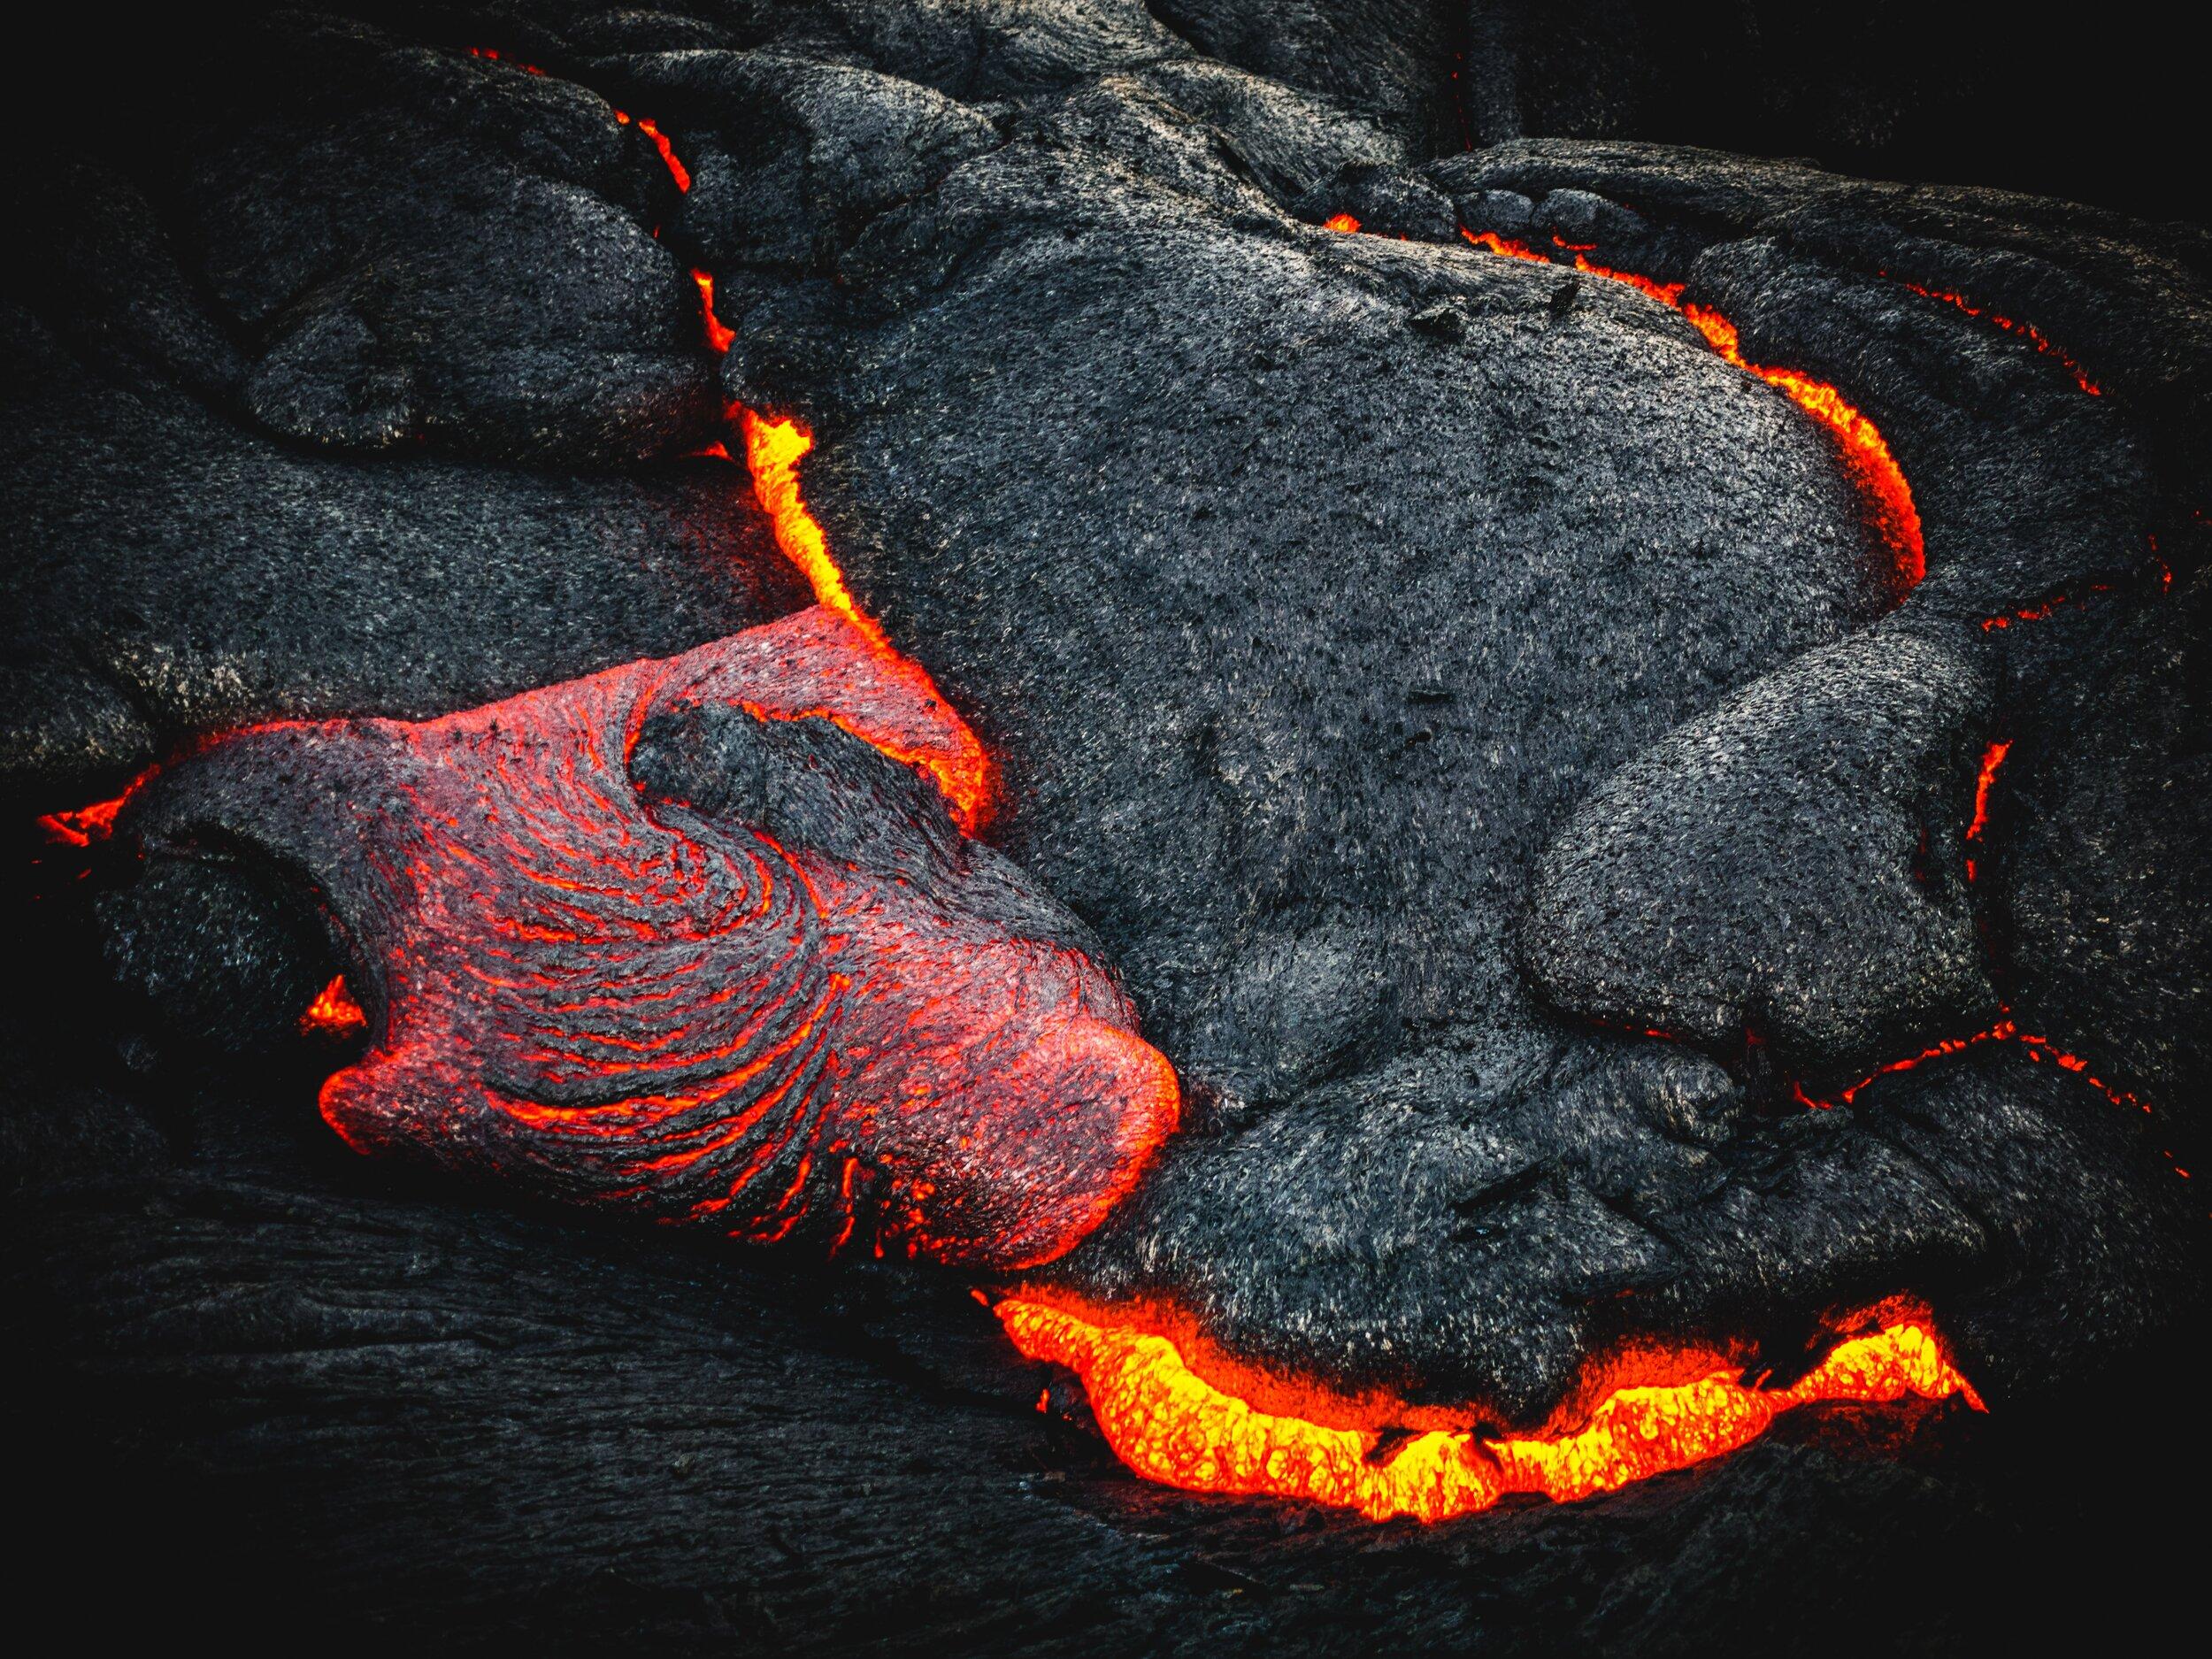 volcanic lava.jpg